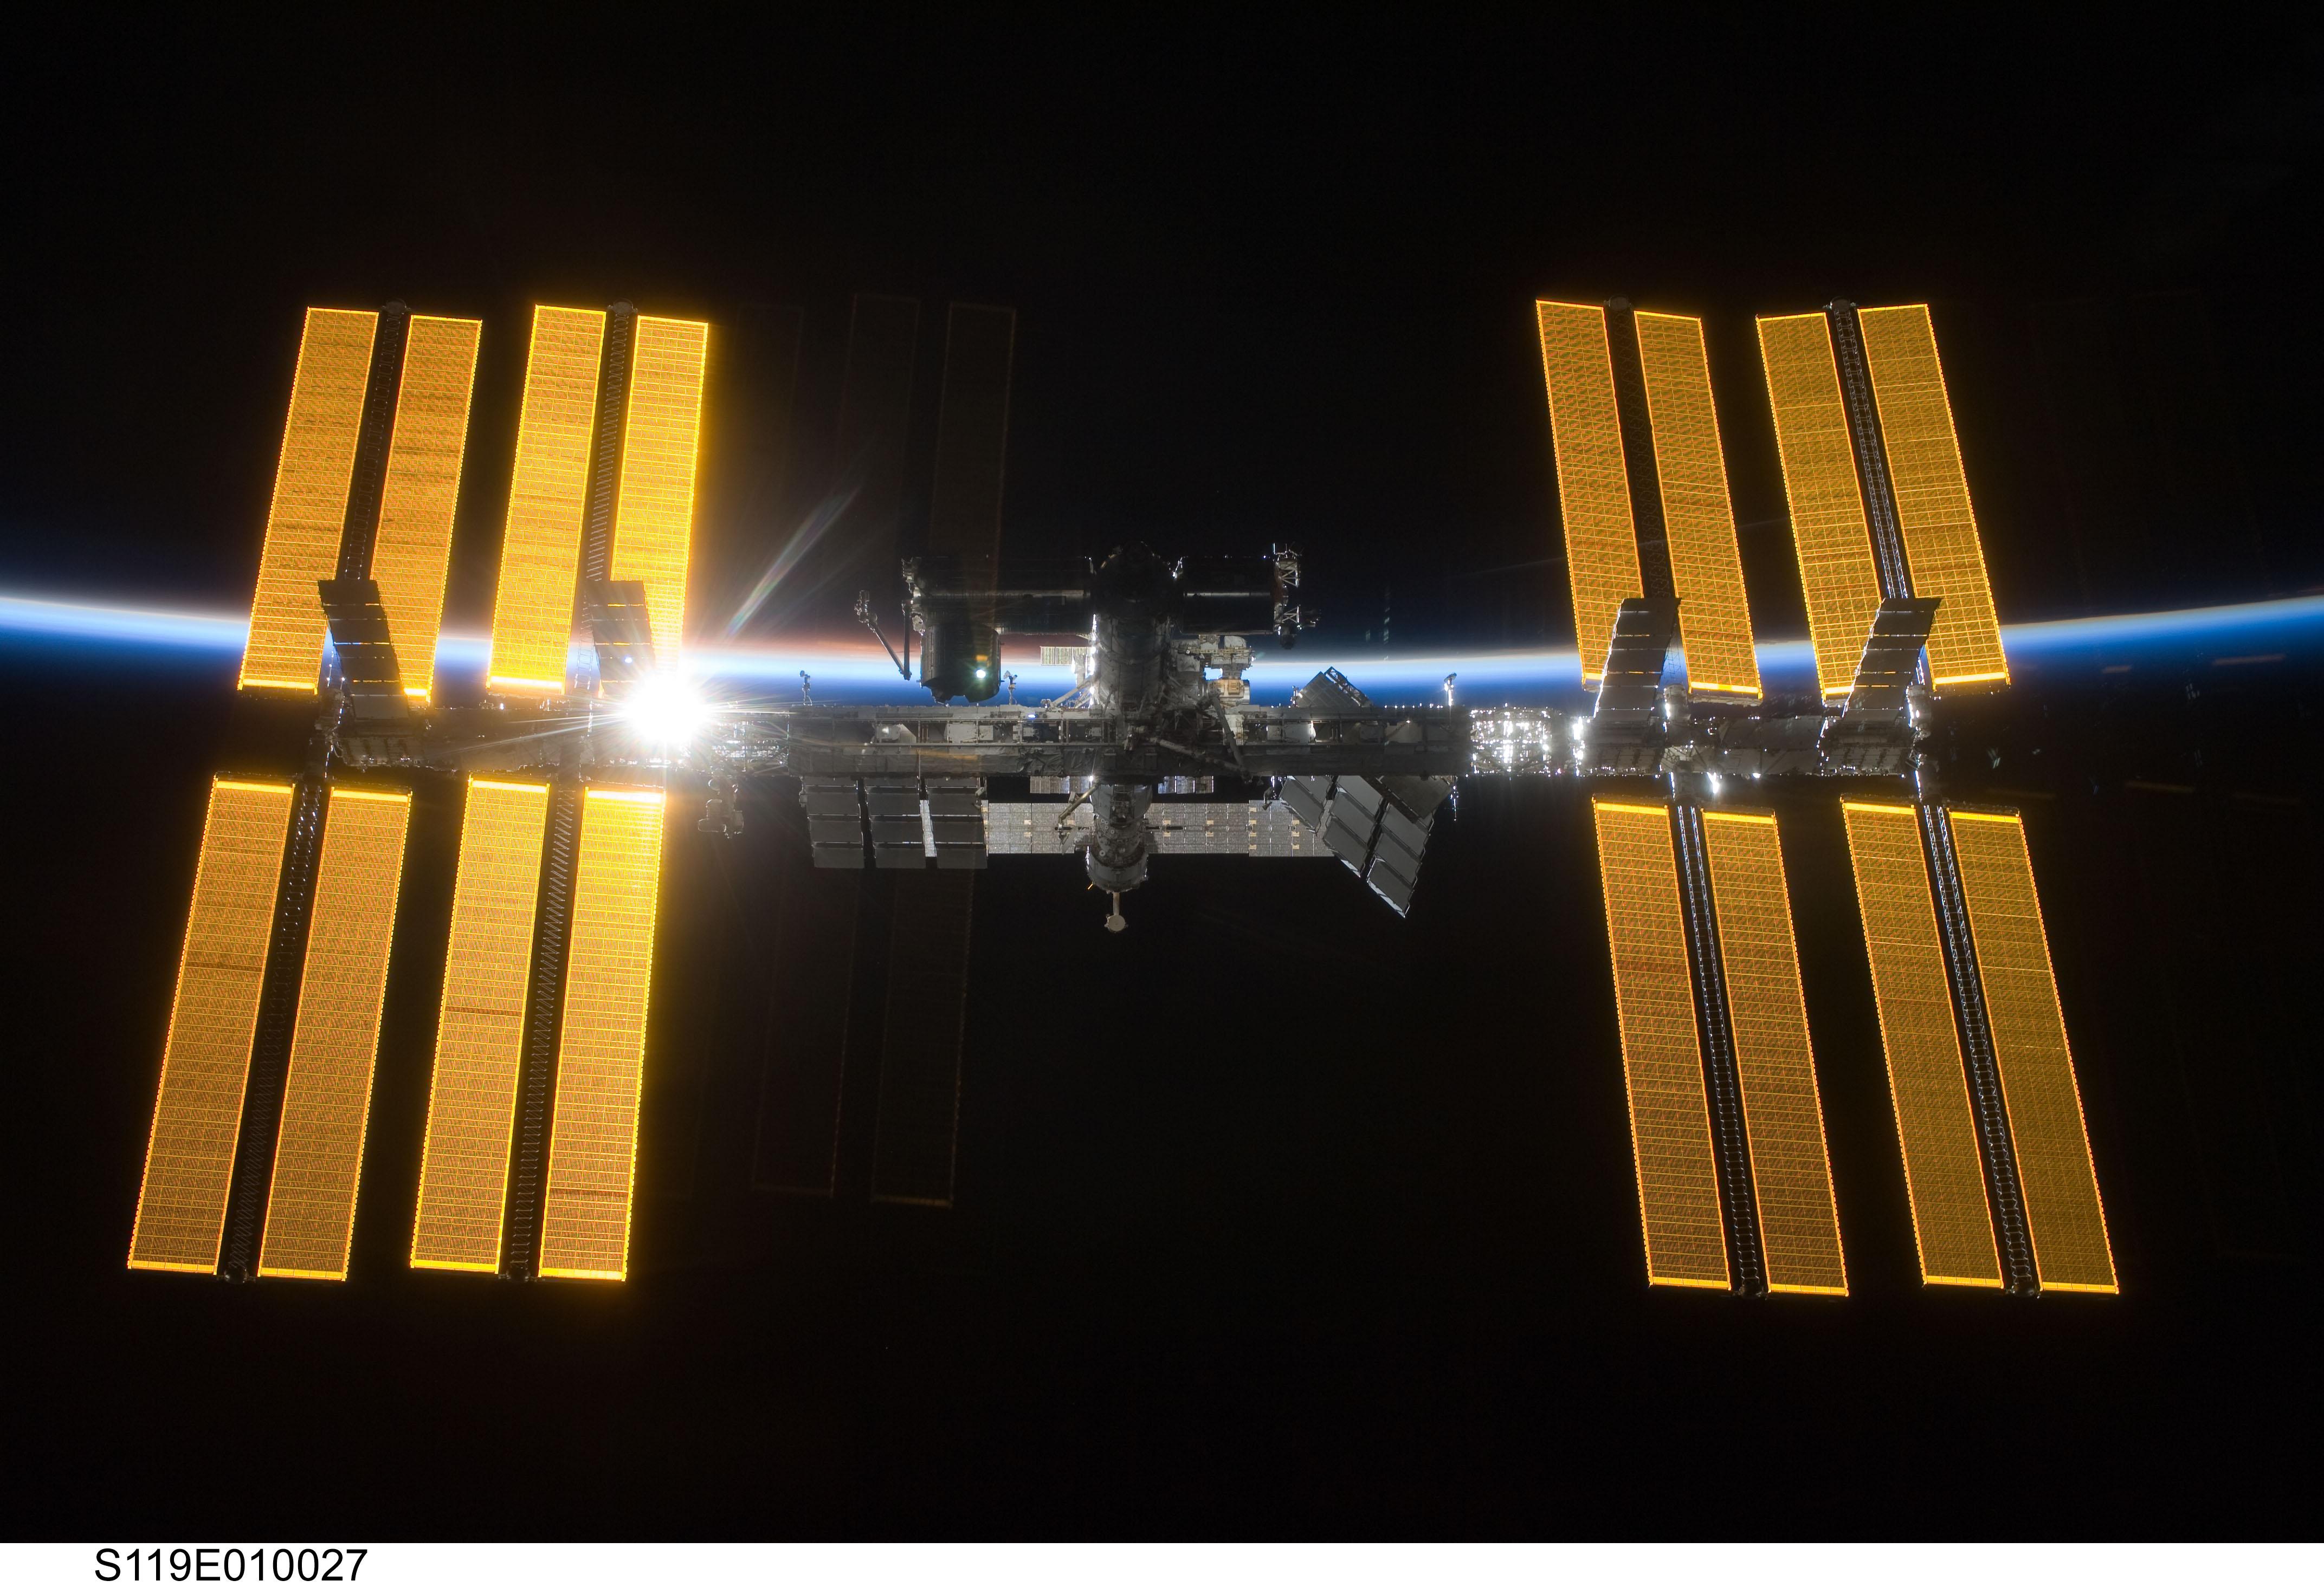 spacecraft solar array panels - photo #38